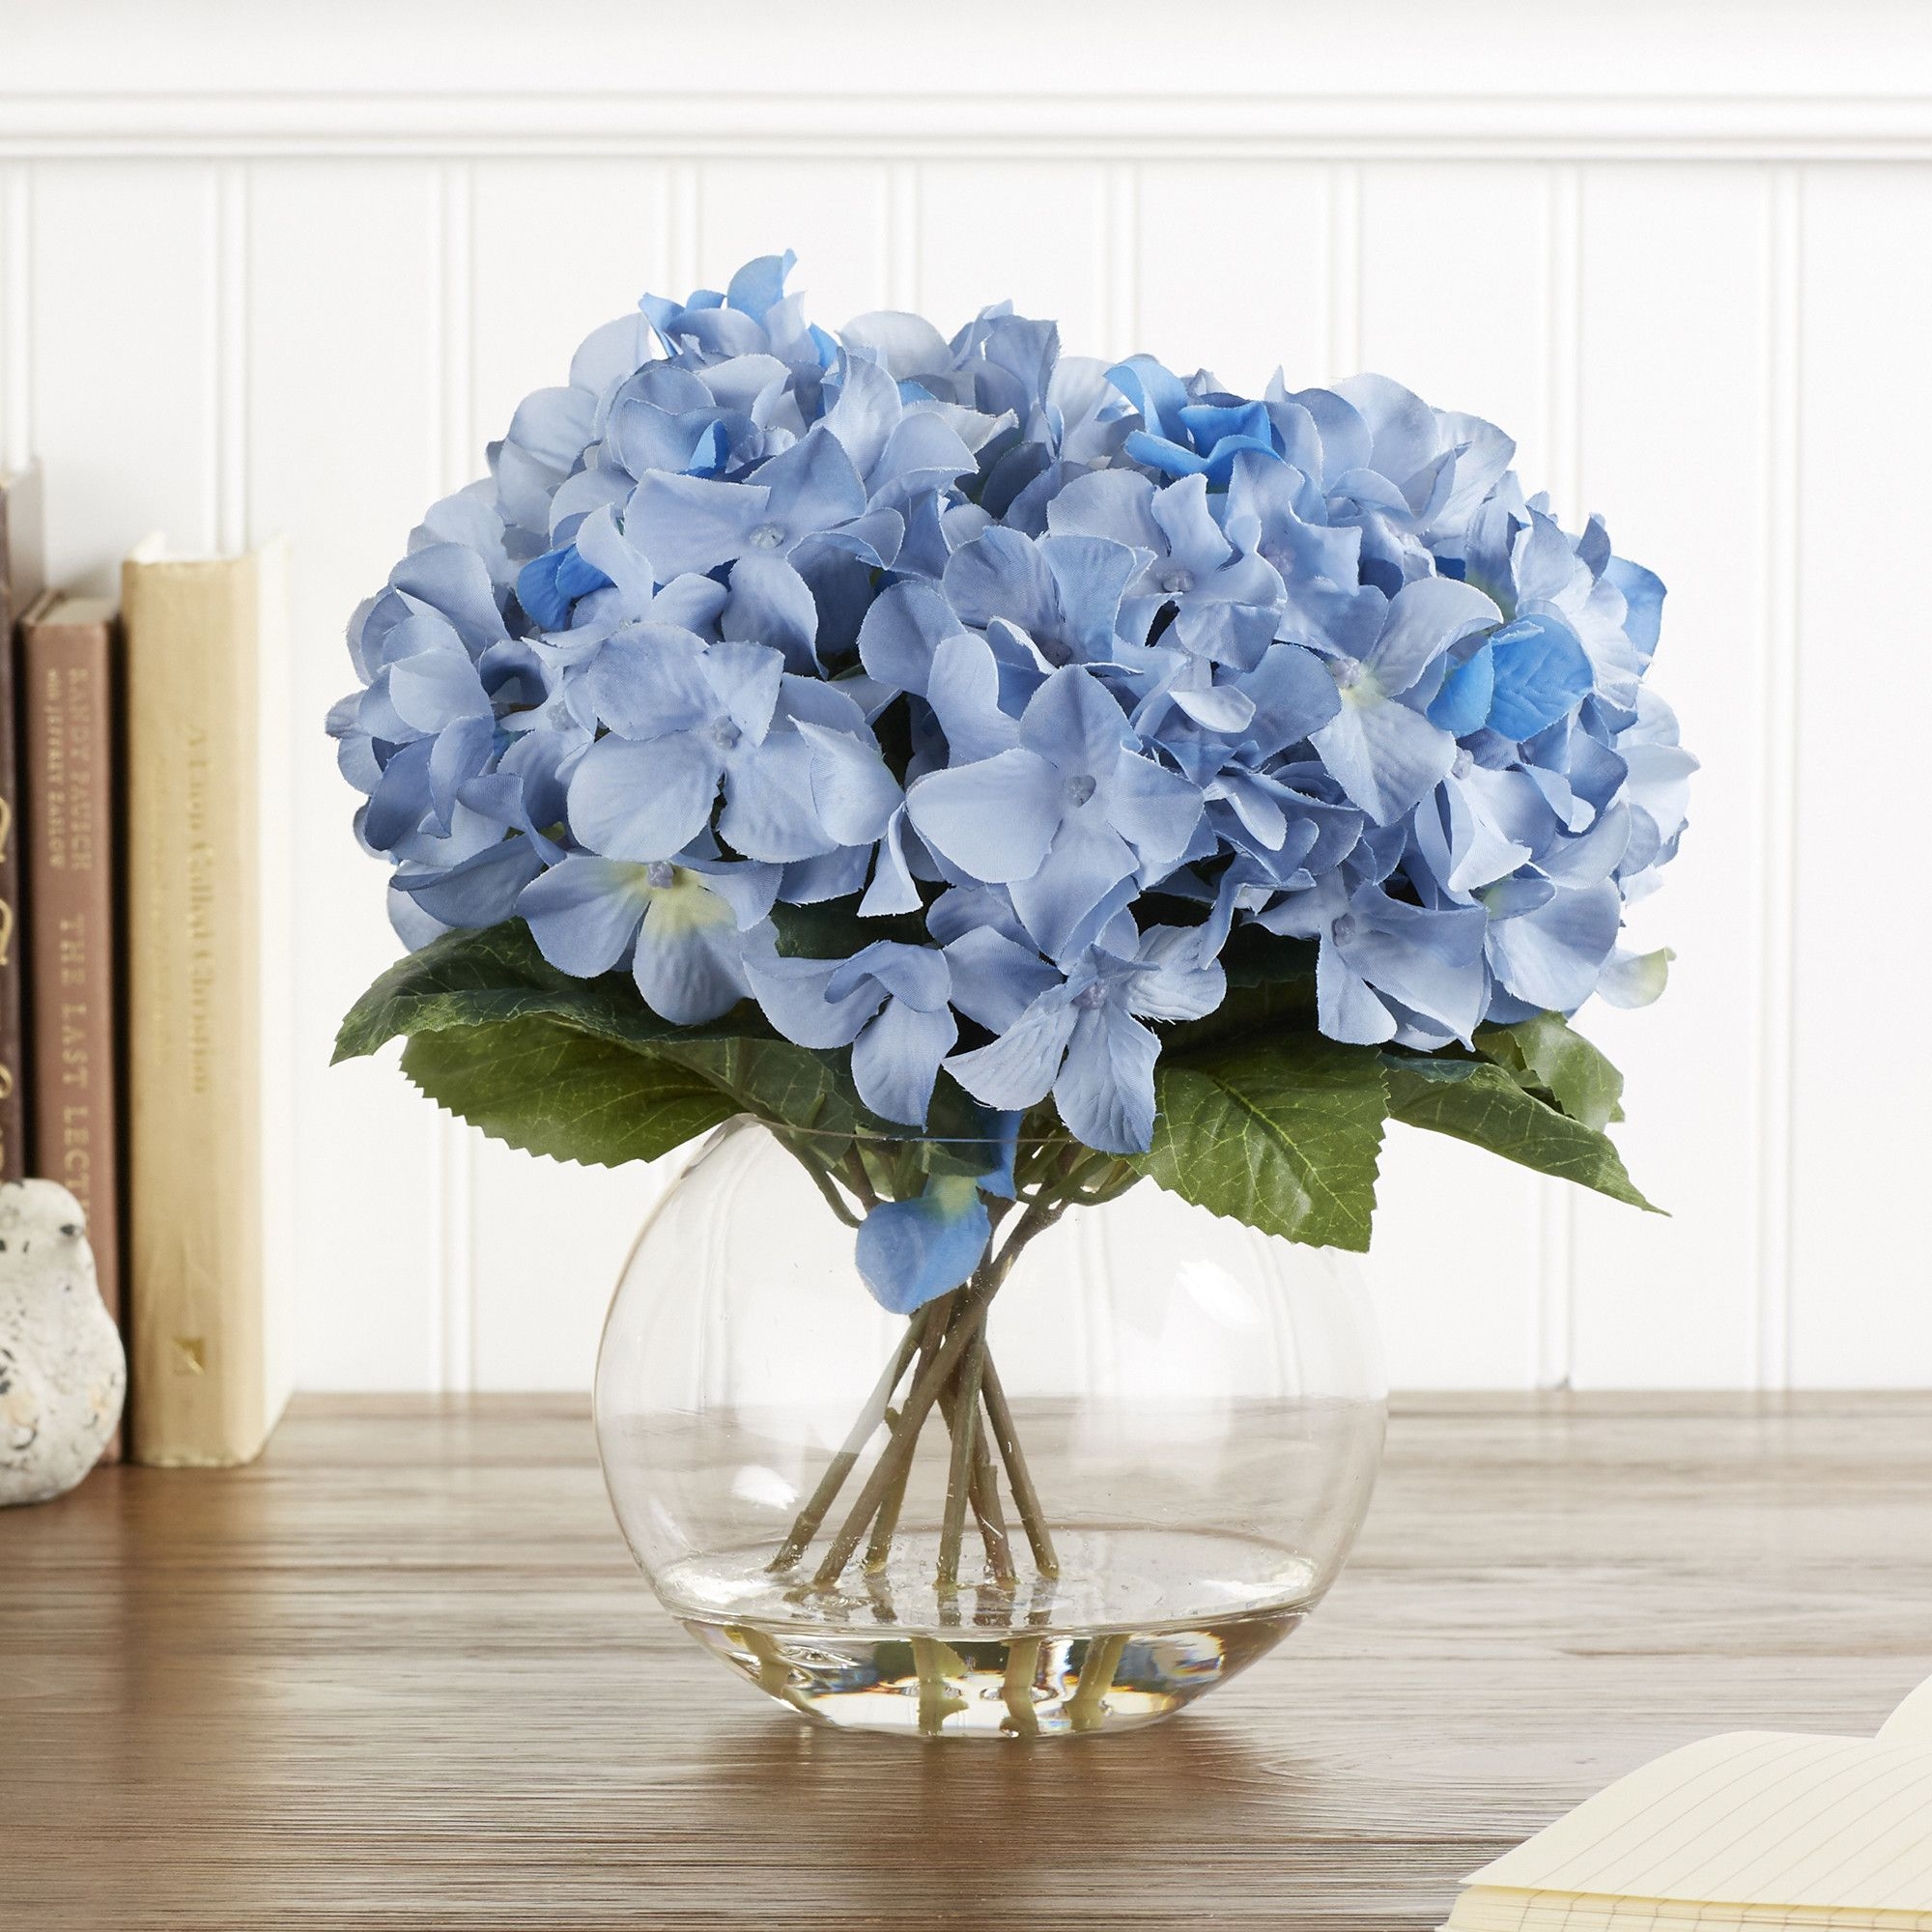 Faux Blue Hydrangea Reviews Joss Main Summer Arrangement Sale Silk And Poly Hydrangea Arrangements Hydrangea Bloom Peonies And Hydrangeas